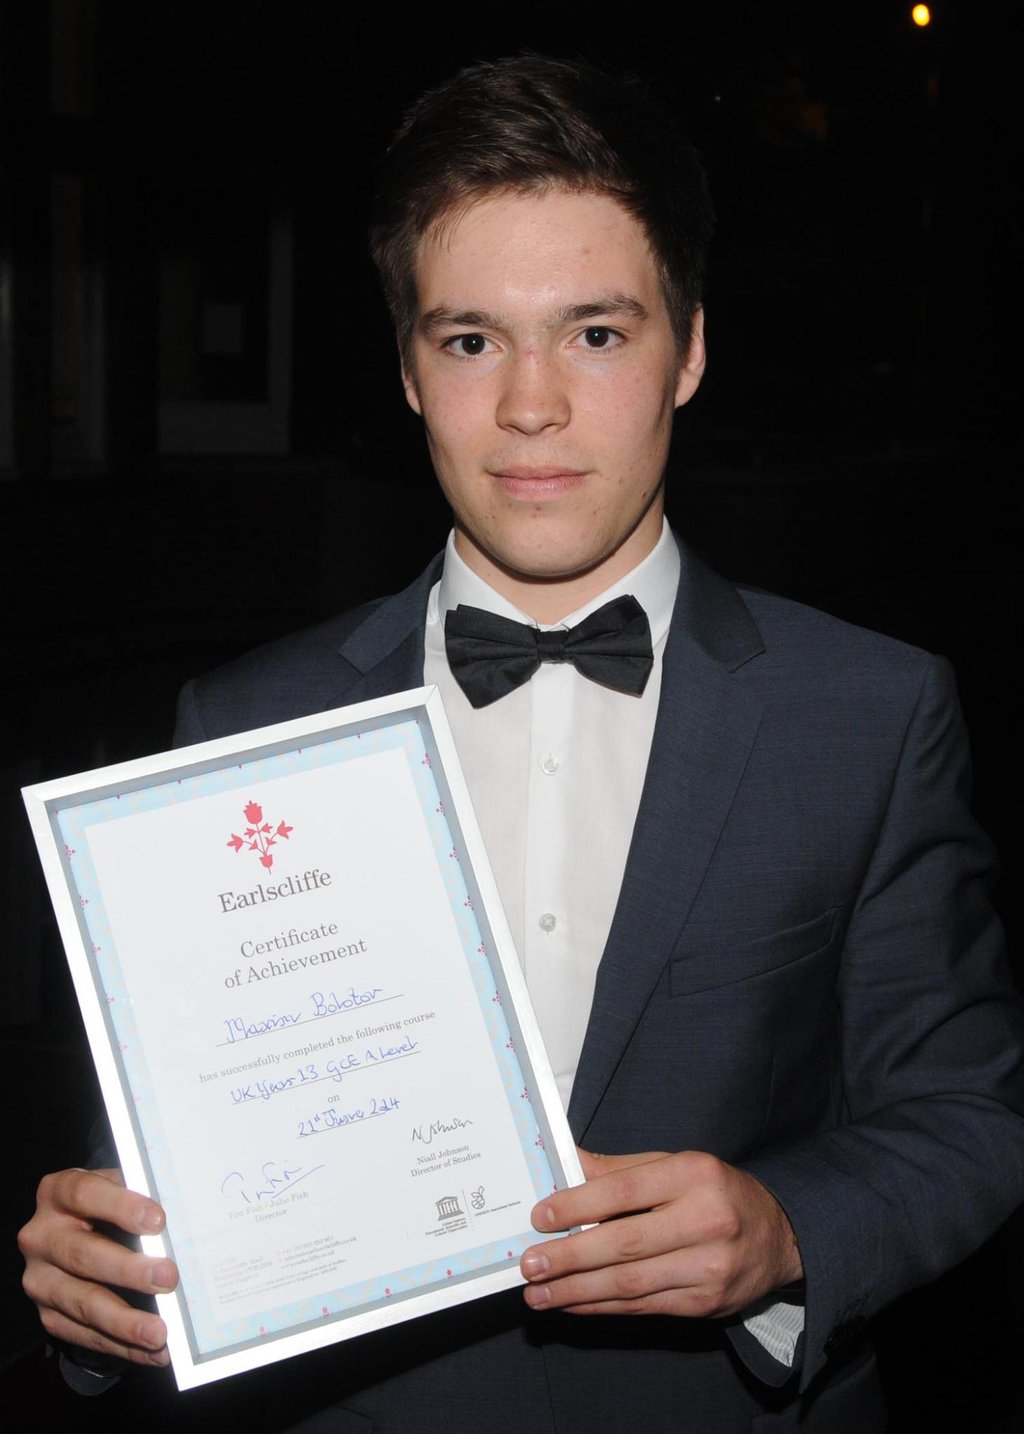 Сертификат достижений